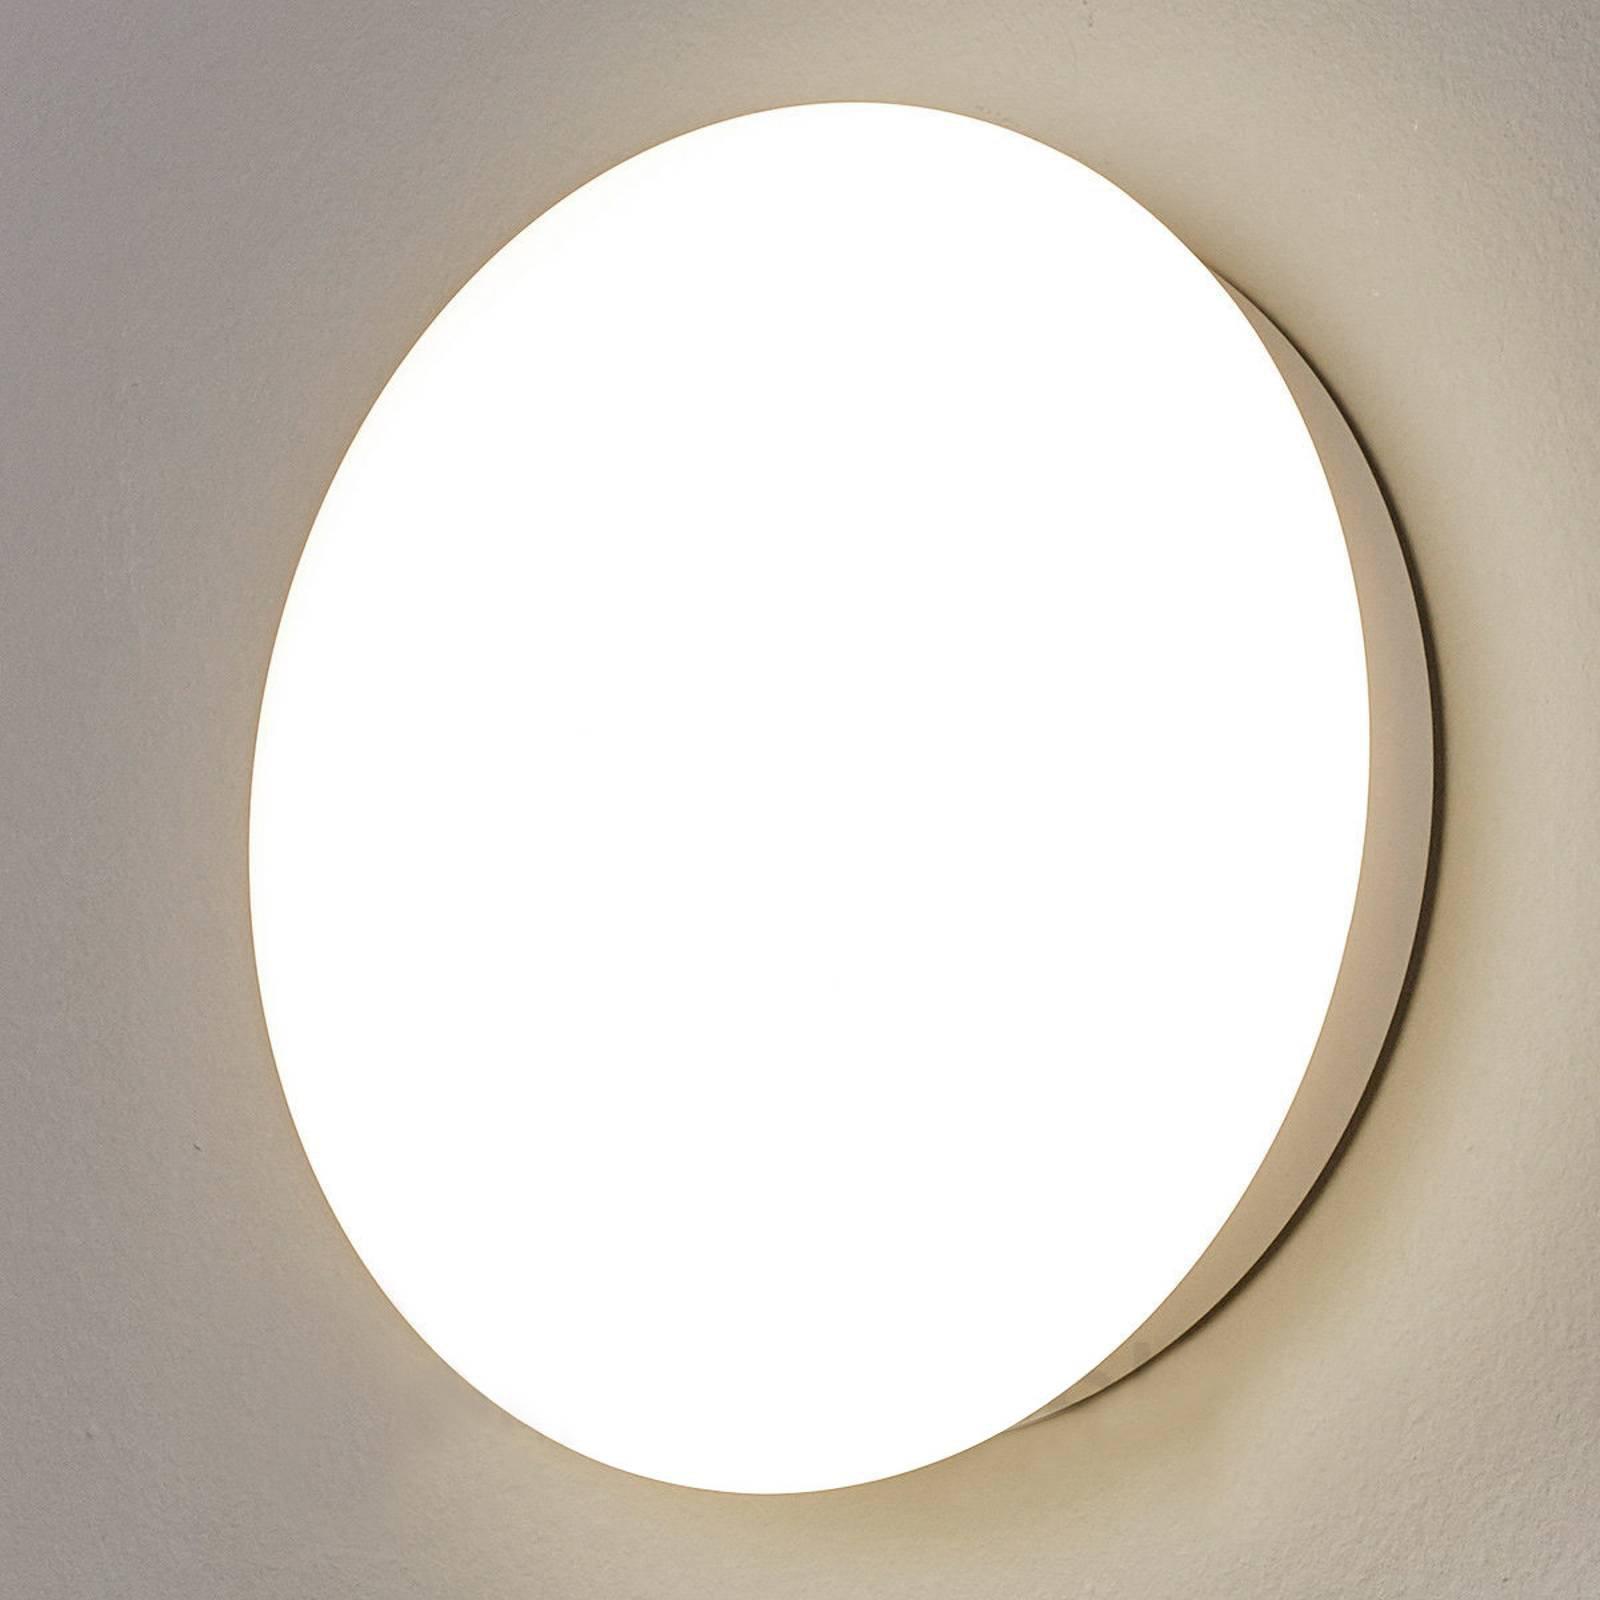 SUN 12 LED-vegglampe, IP55, 18 W, uni-hvit, 4000 K